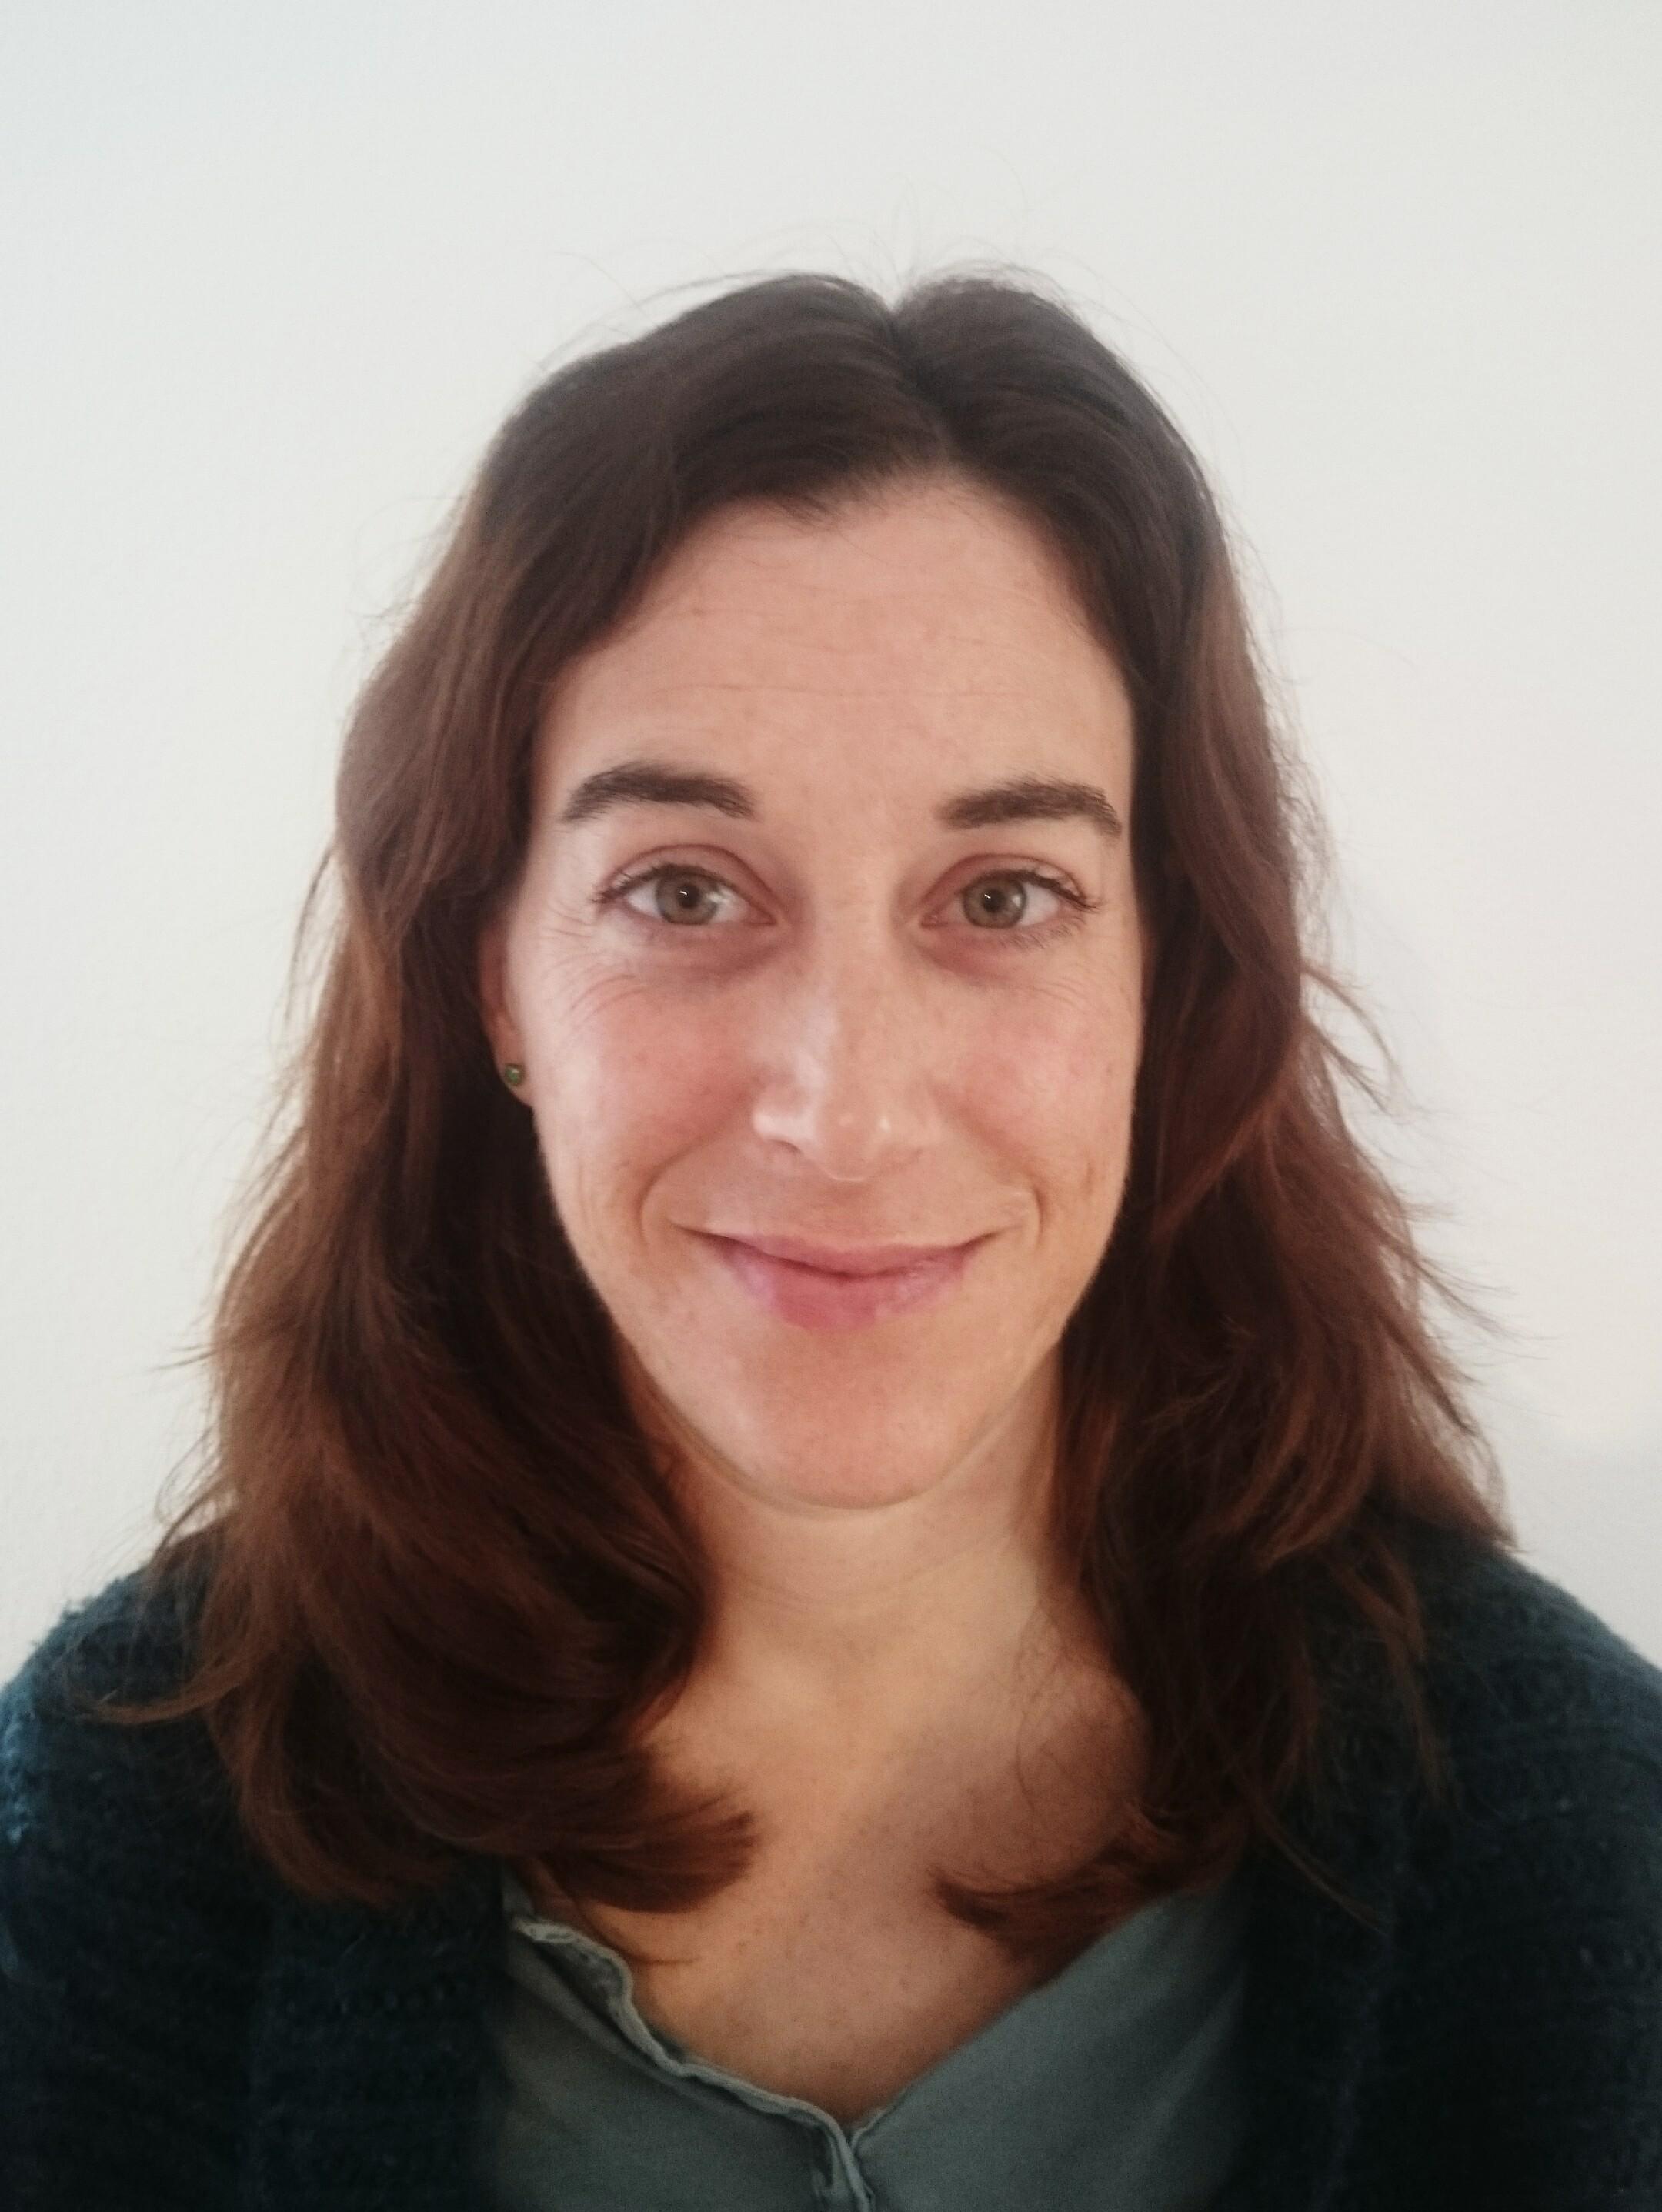 M.A. Lea Ticozzi